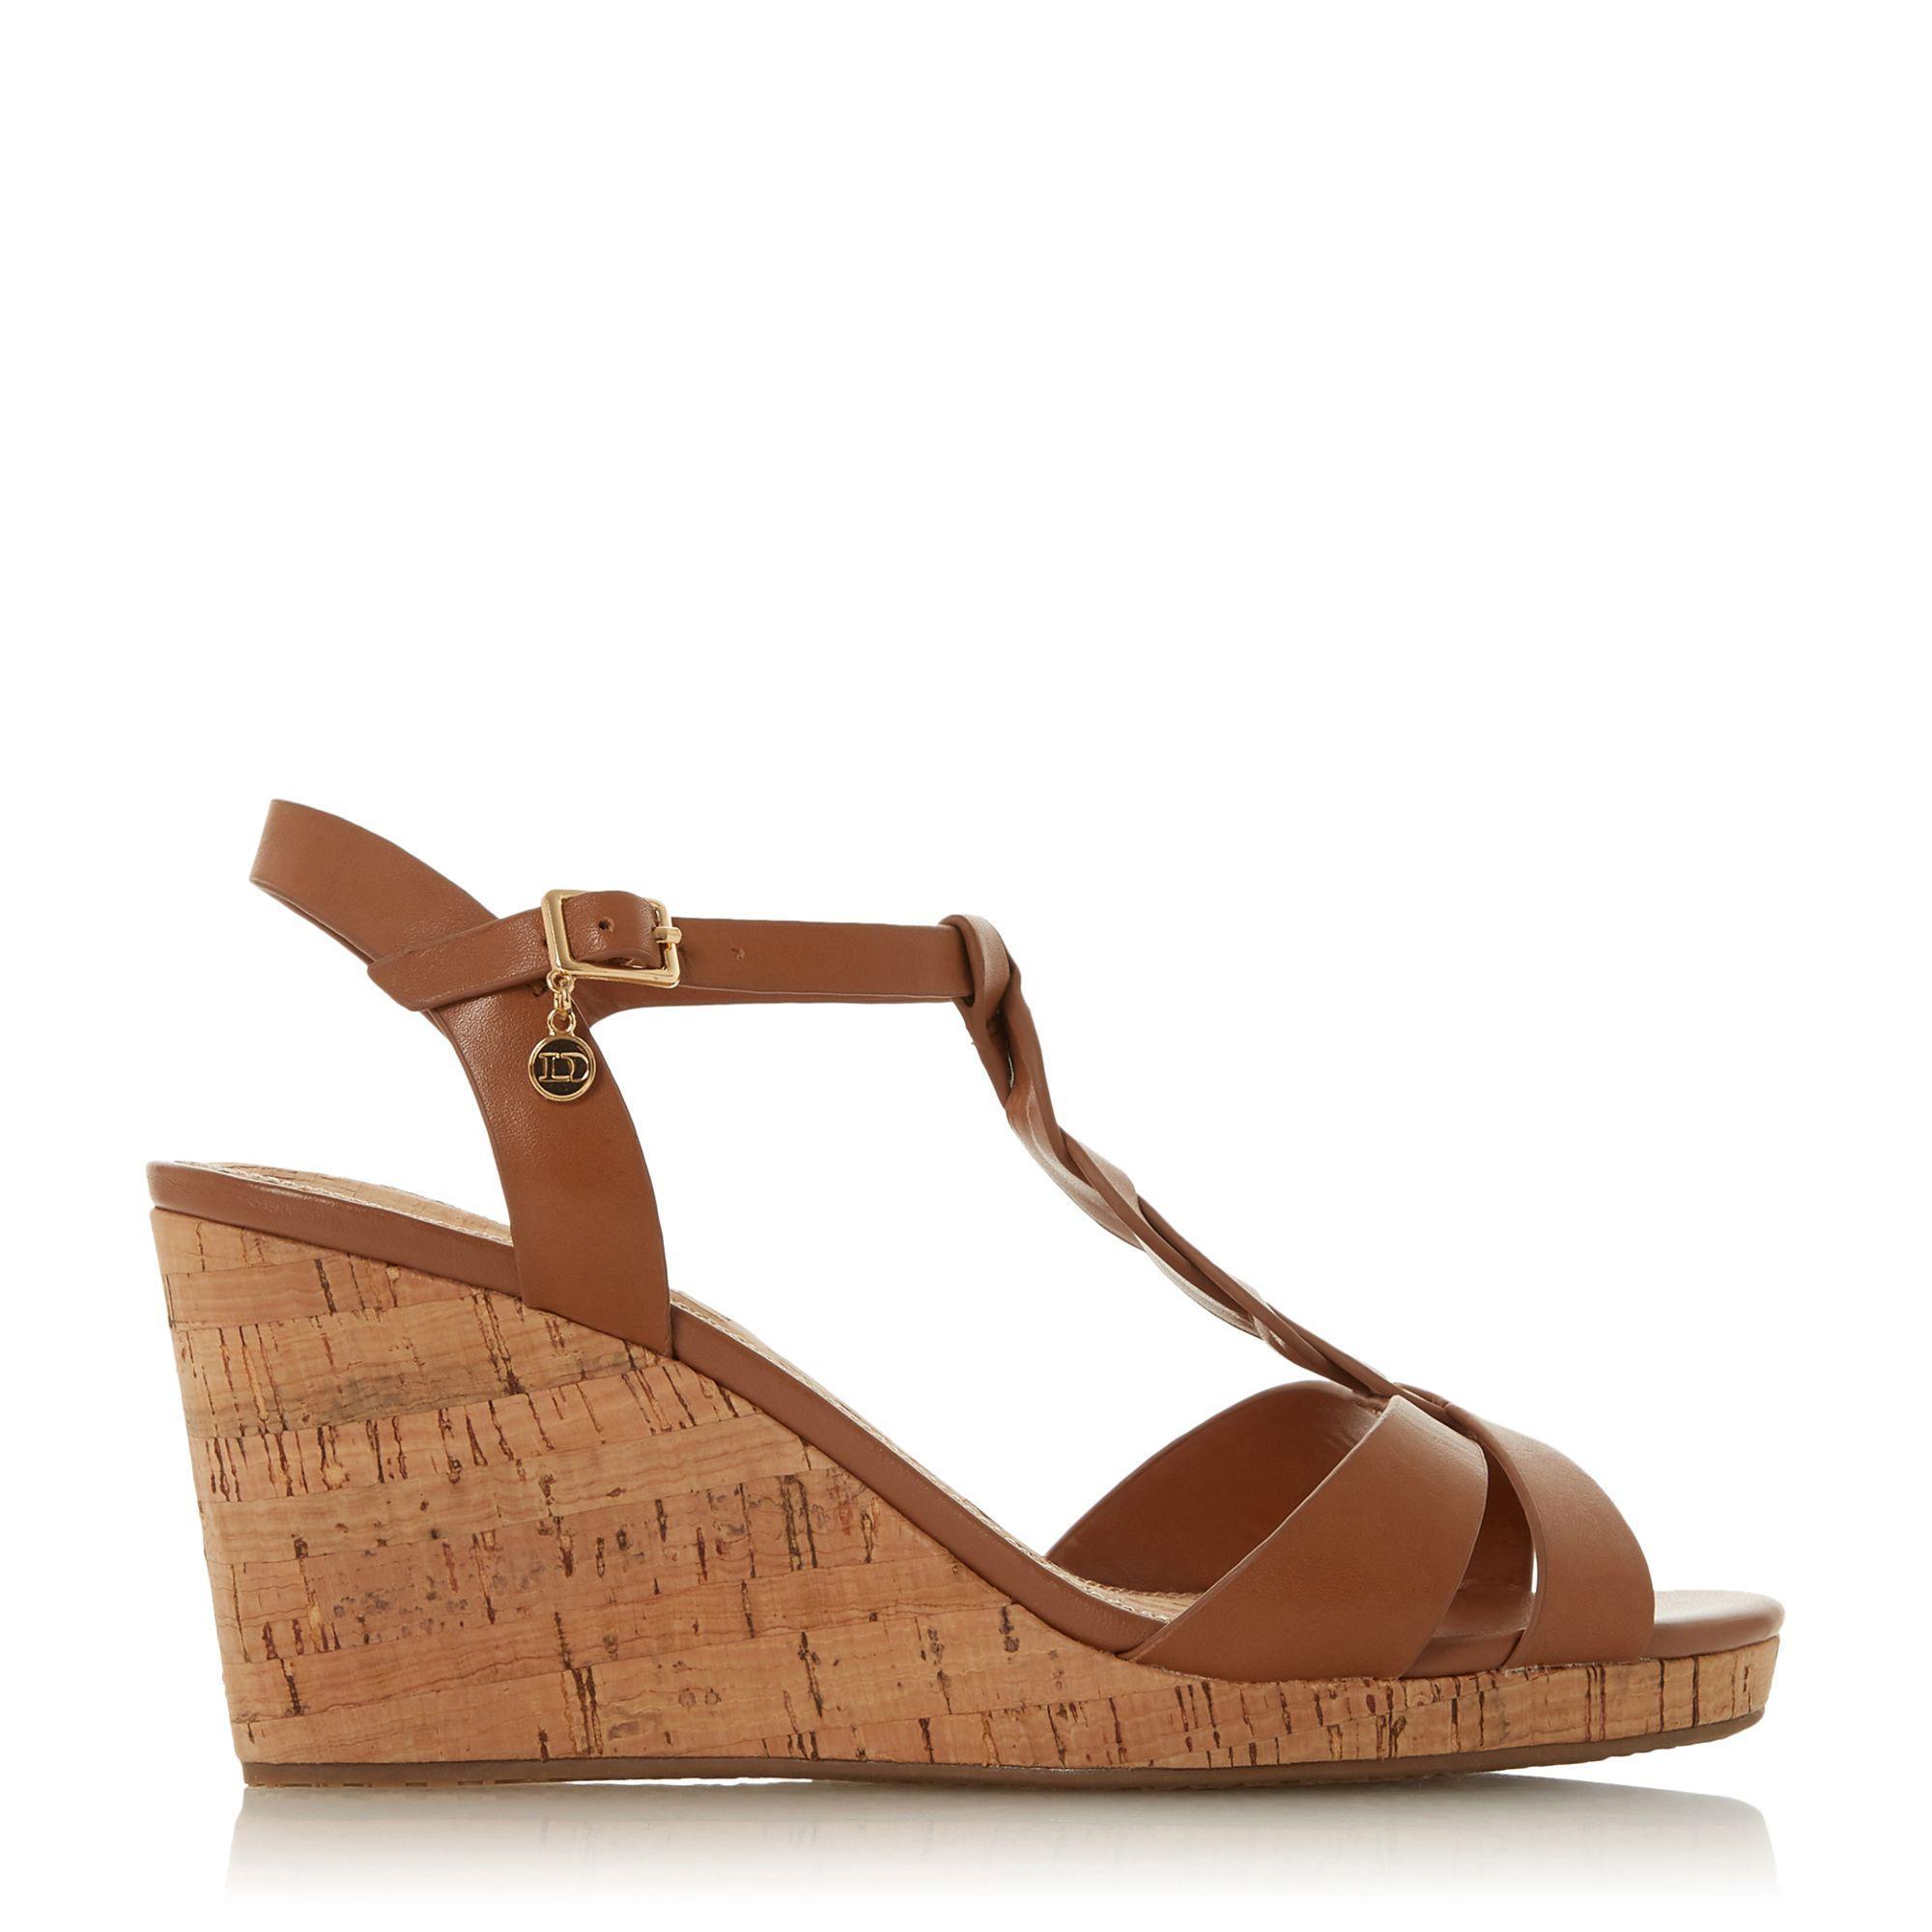 e1db0b79e2f Dune Tan Leather  wf Koala  High Wedge Heel Wide Fit T-bar Sandals ...